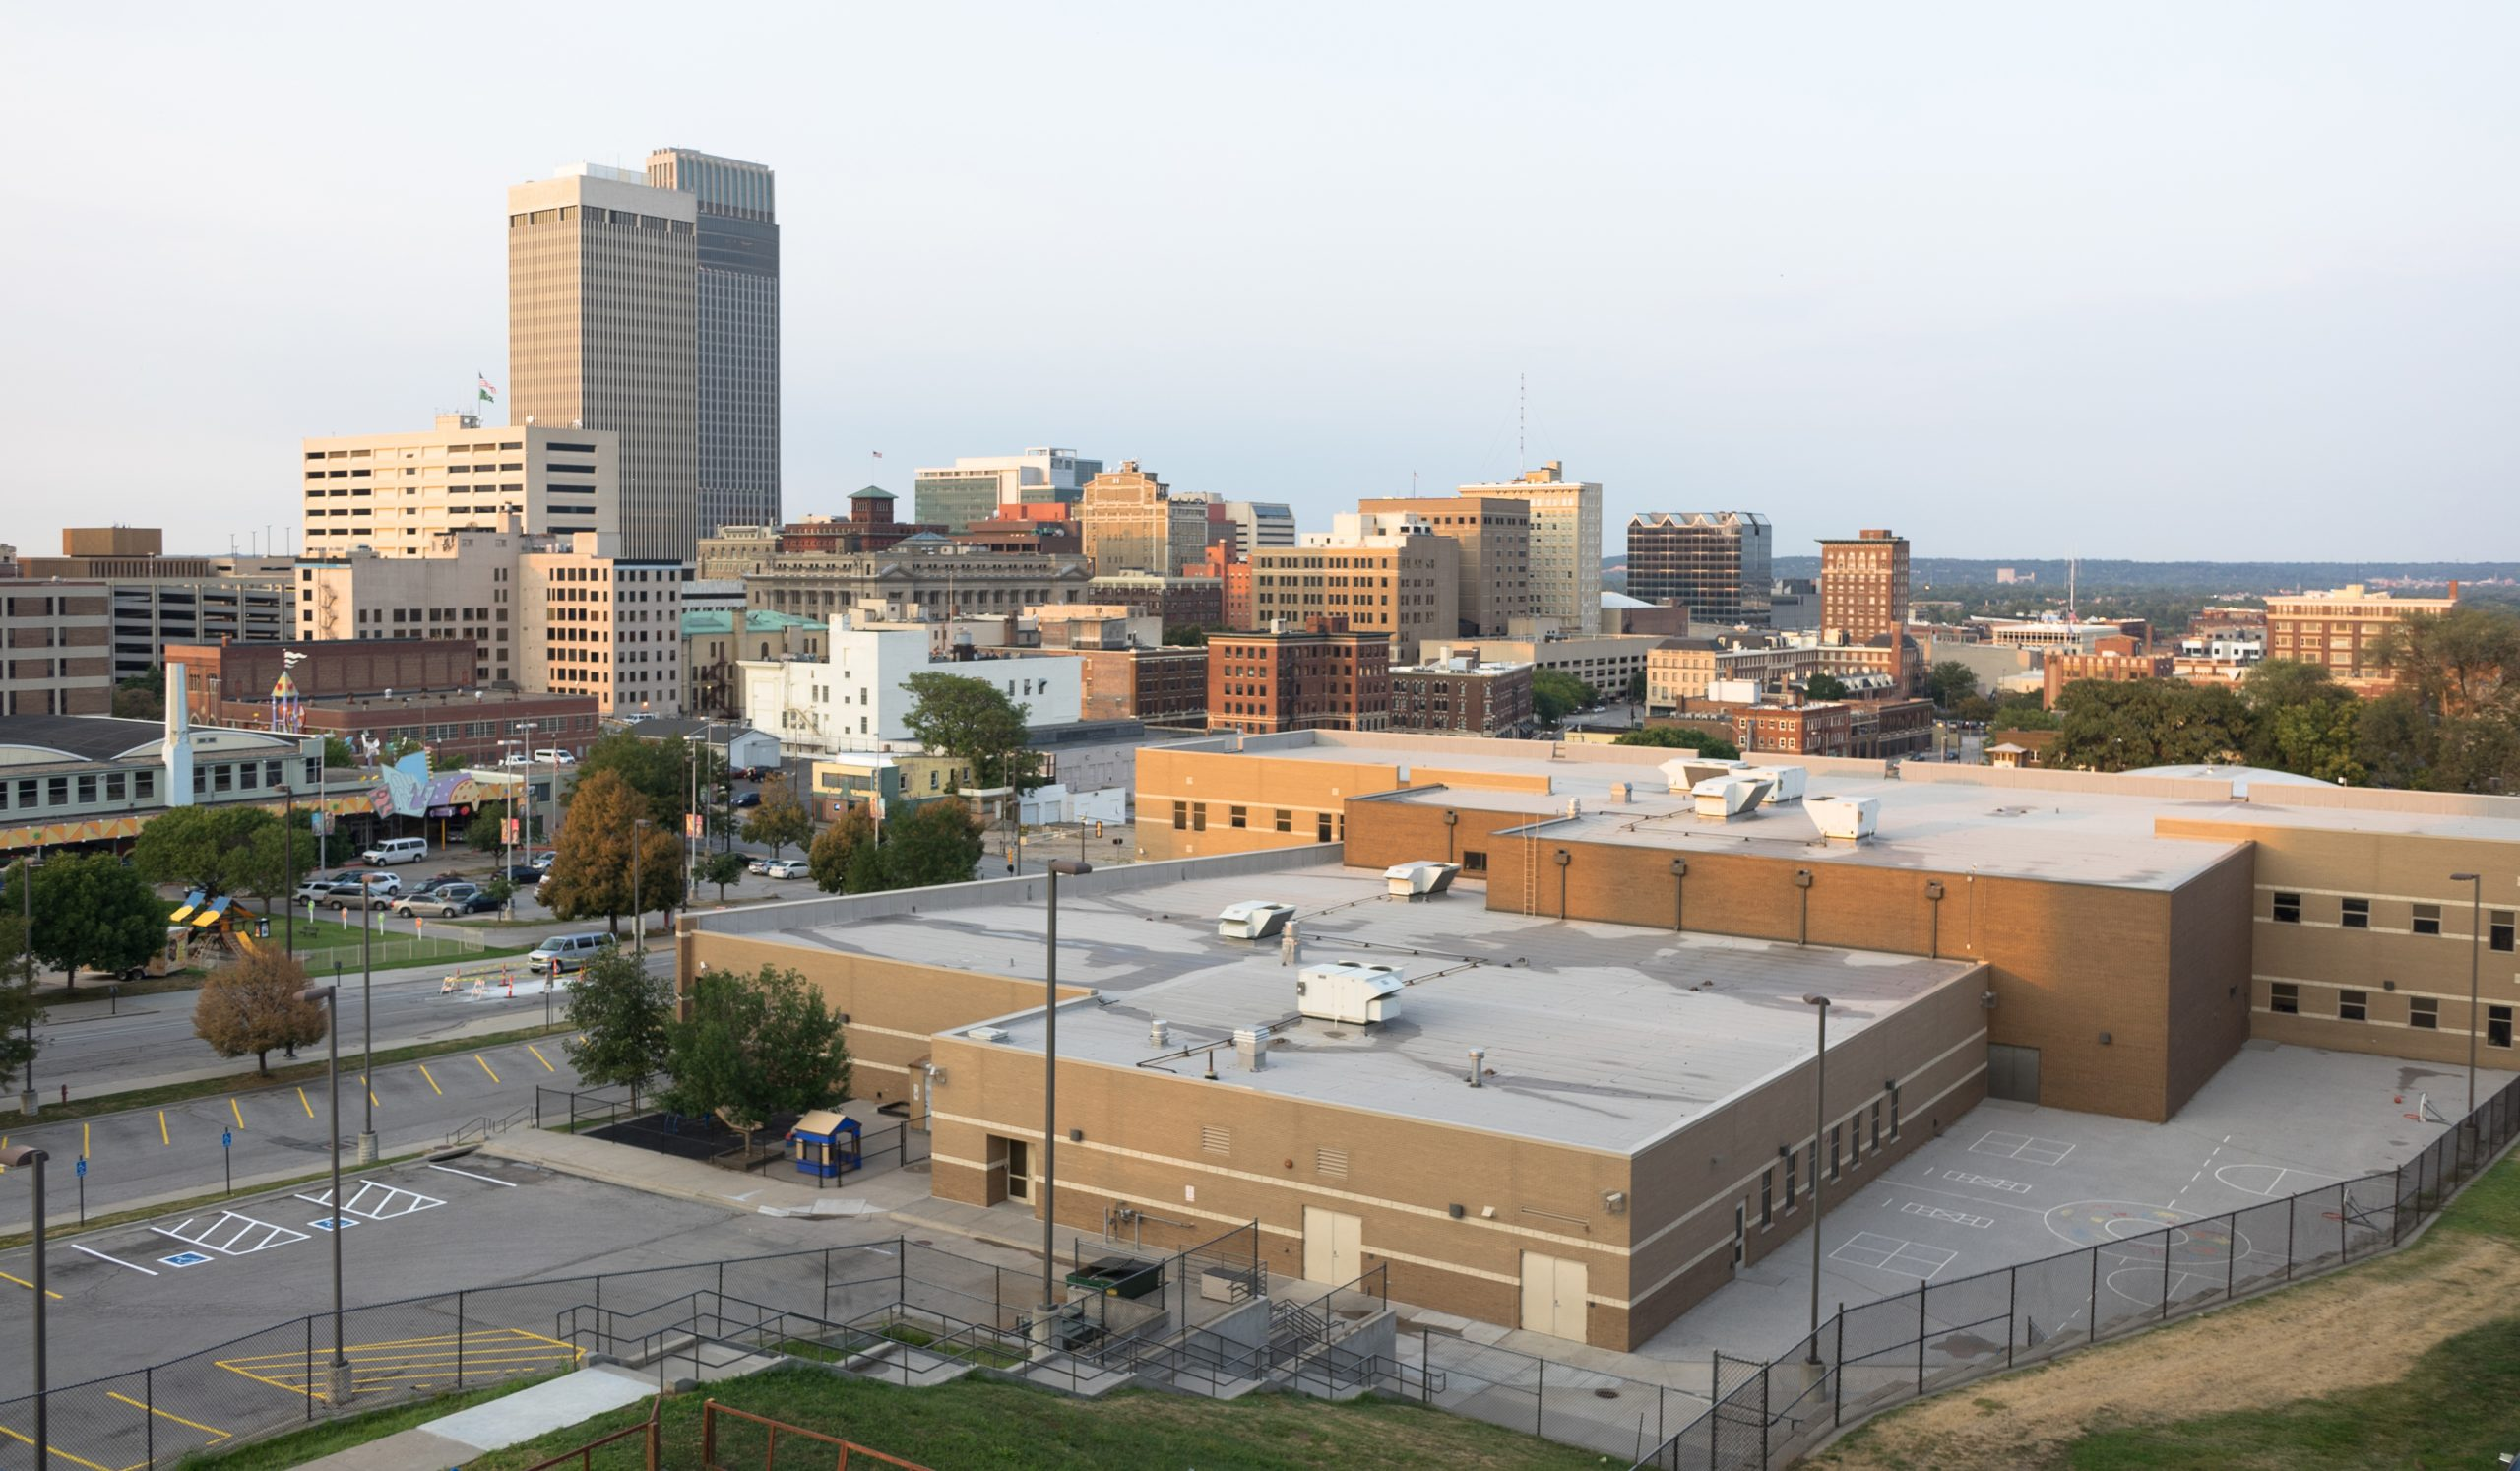 Downtown City Skyline Omaha Nebraska Midwest Urban Landscape